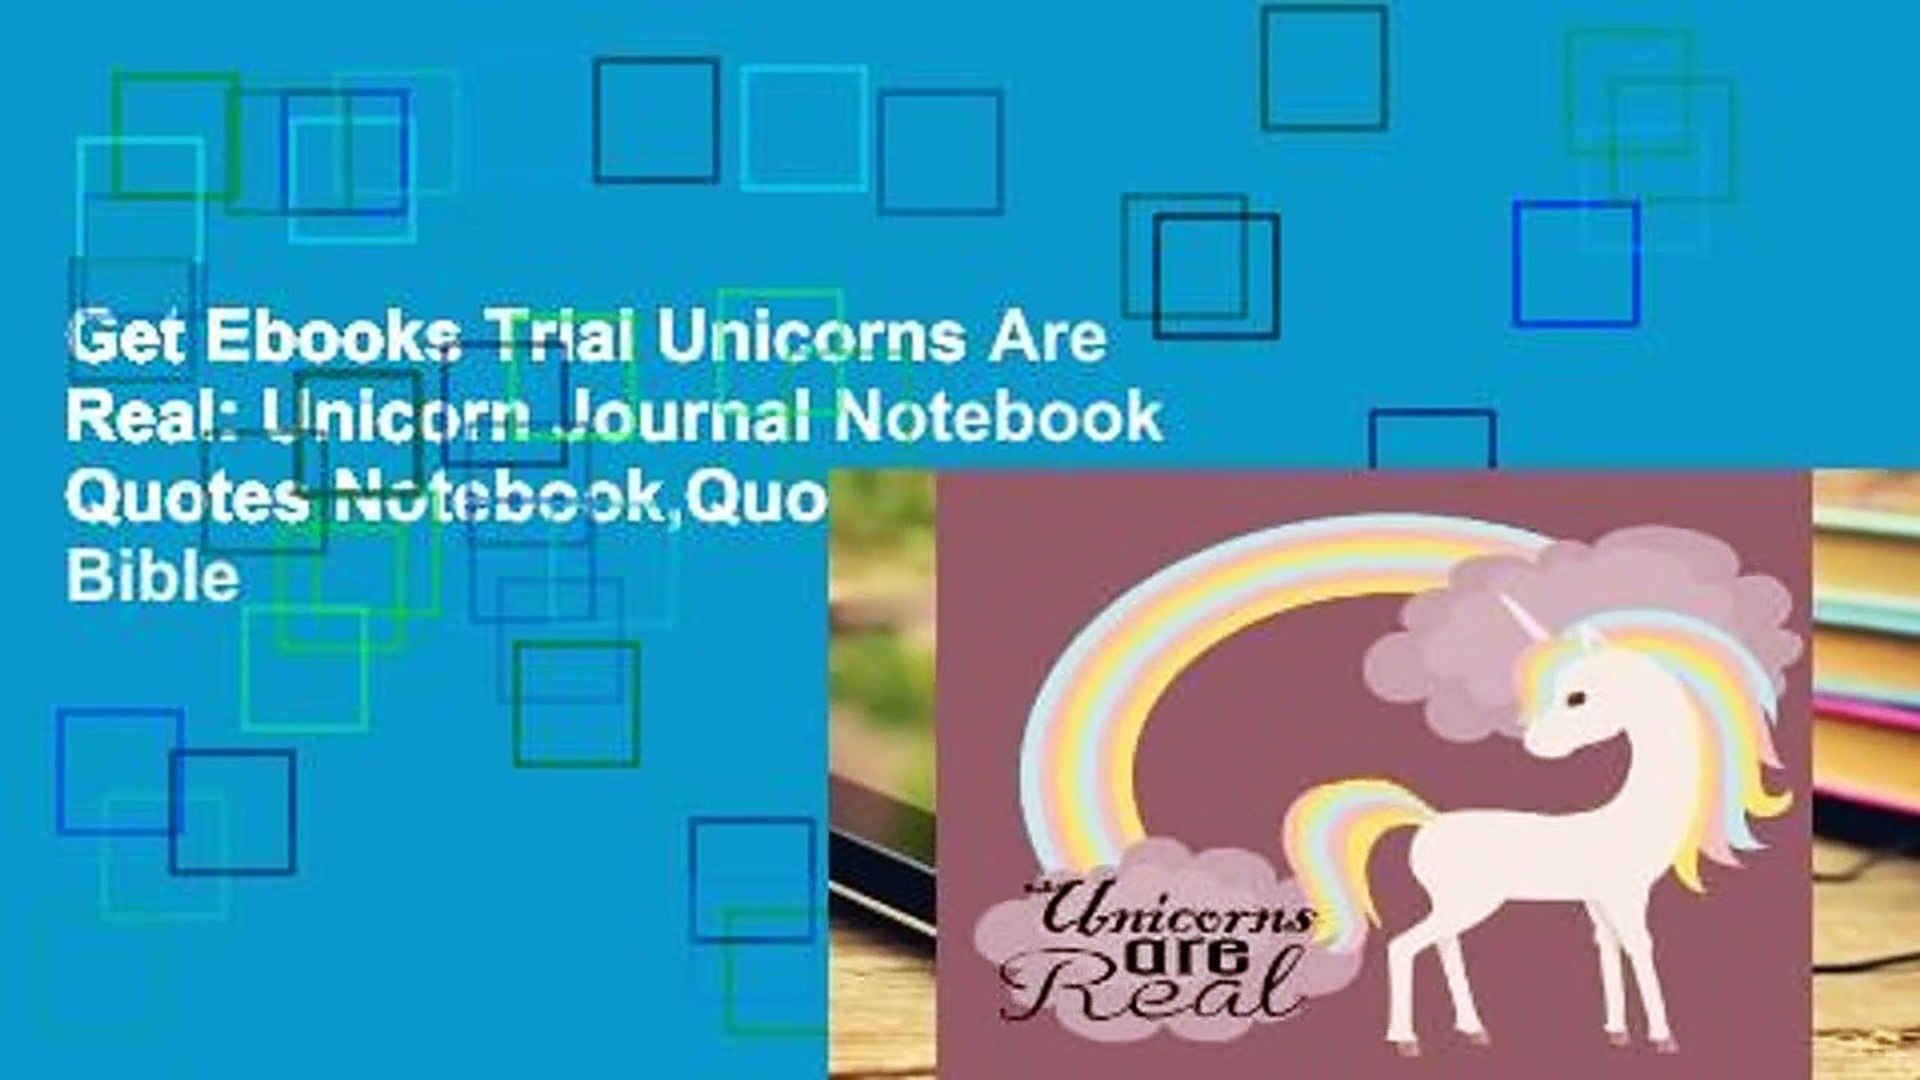 Get Ebooks Trial Unicorns Are Real: Unicorn Journal Notebook Quotes Notebook,Quotes Journal, Bible